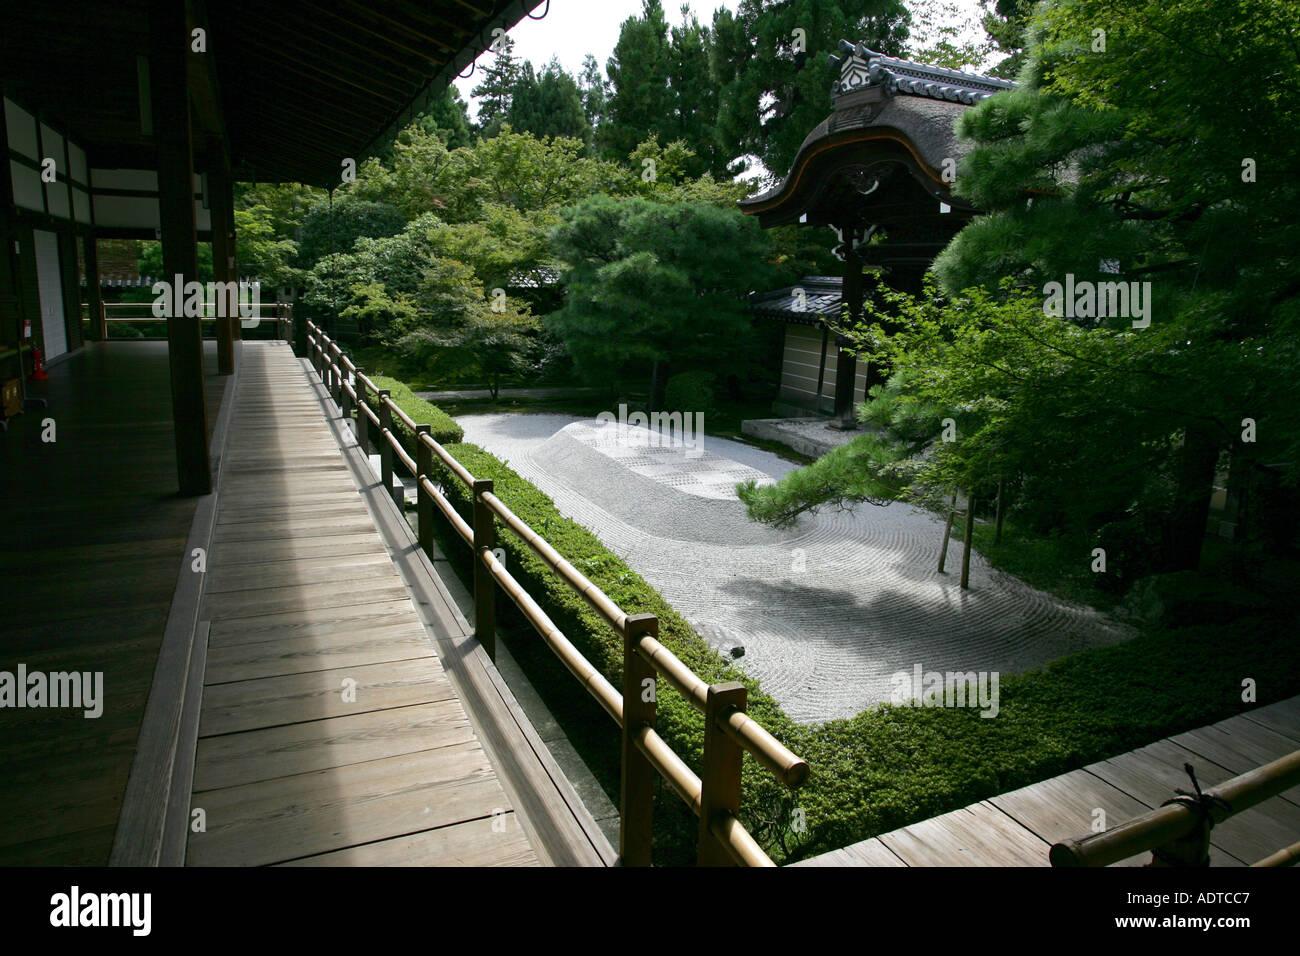 Ancient japanese zen gardens - A Small Zen Garden Inside A Temple Complex In The Ancient City Of Kyoto Kansai West Japan Asia